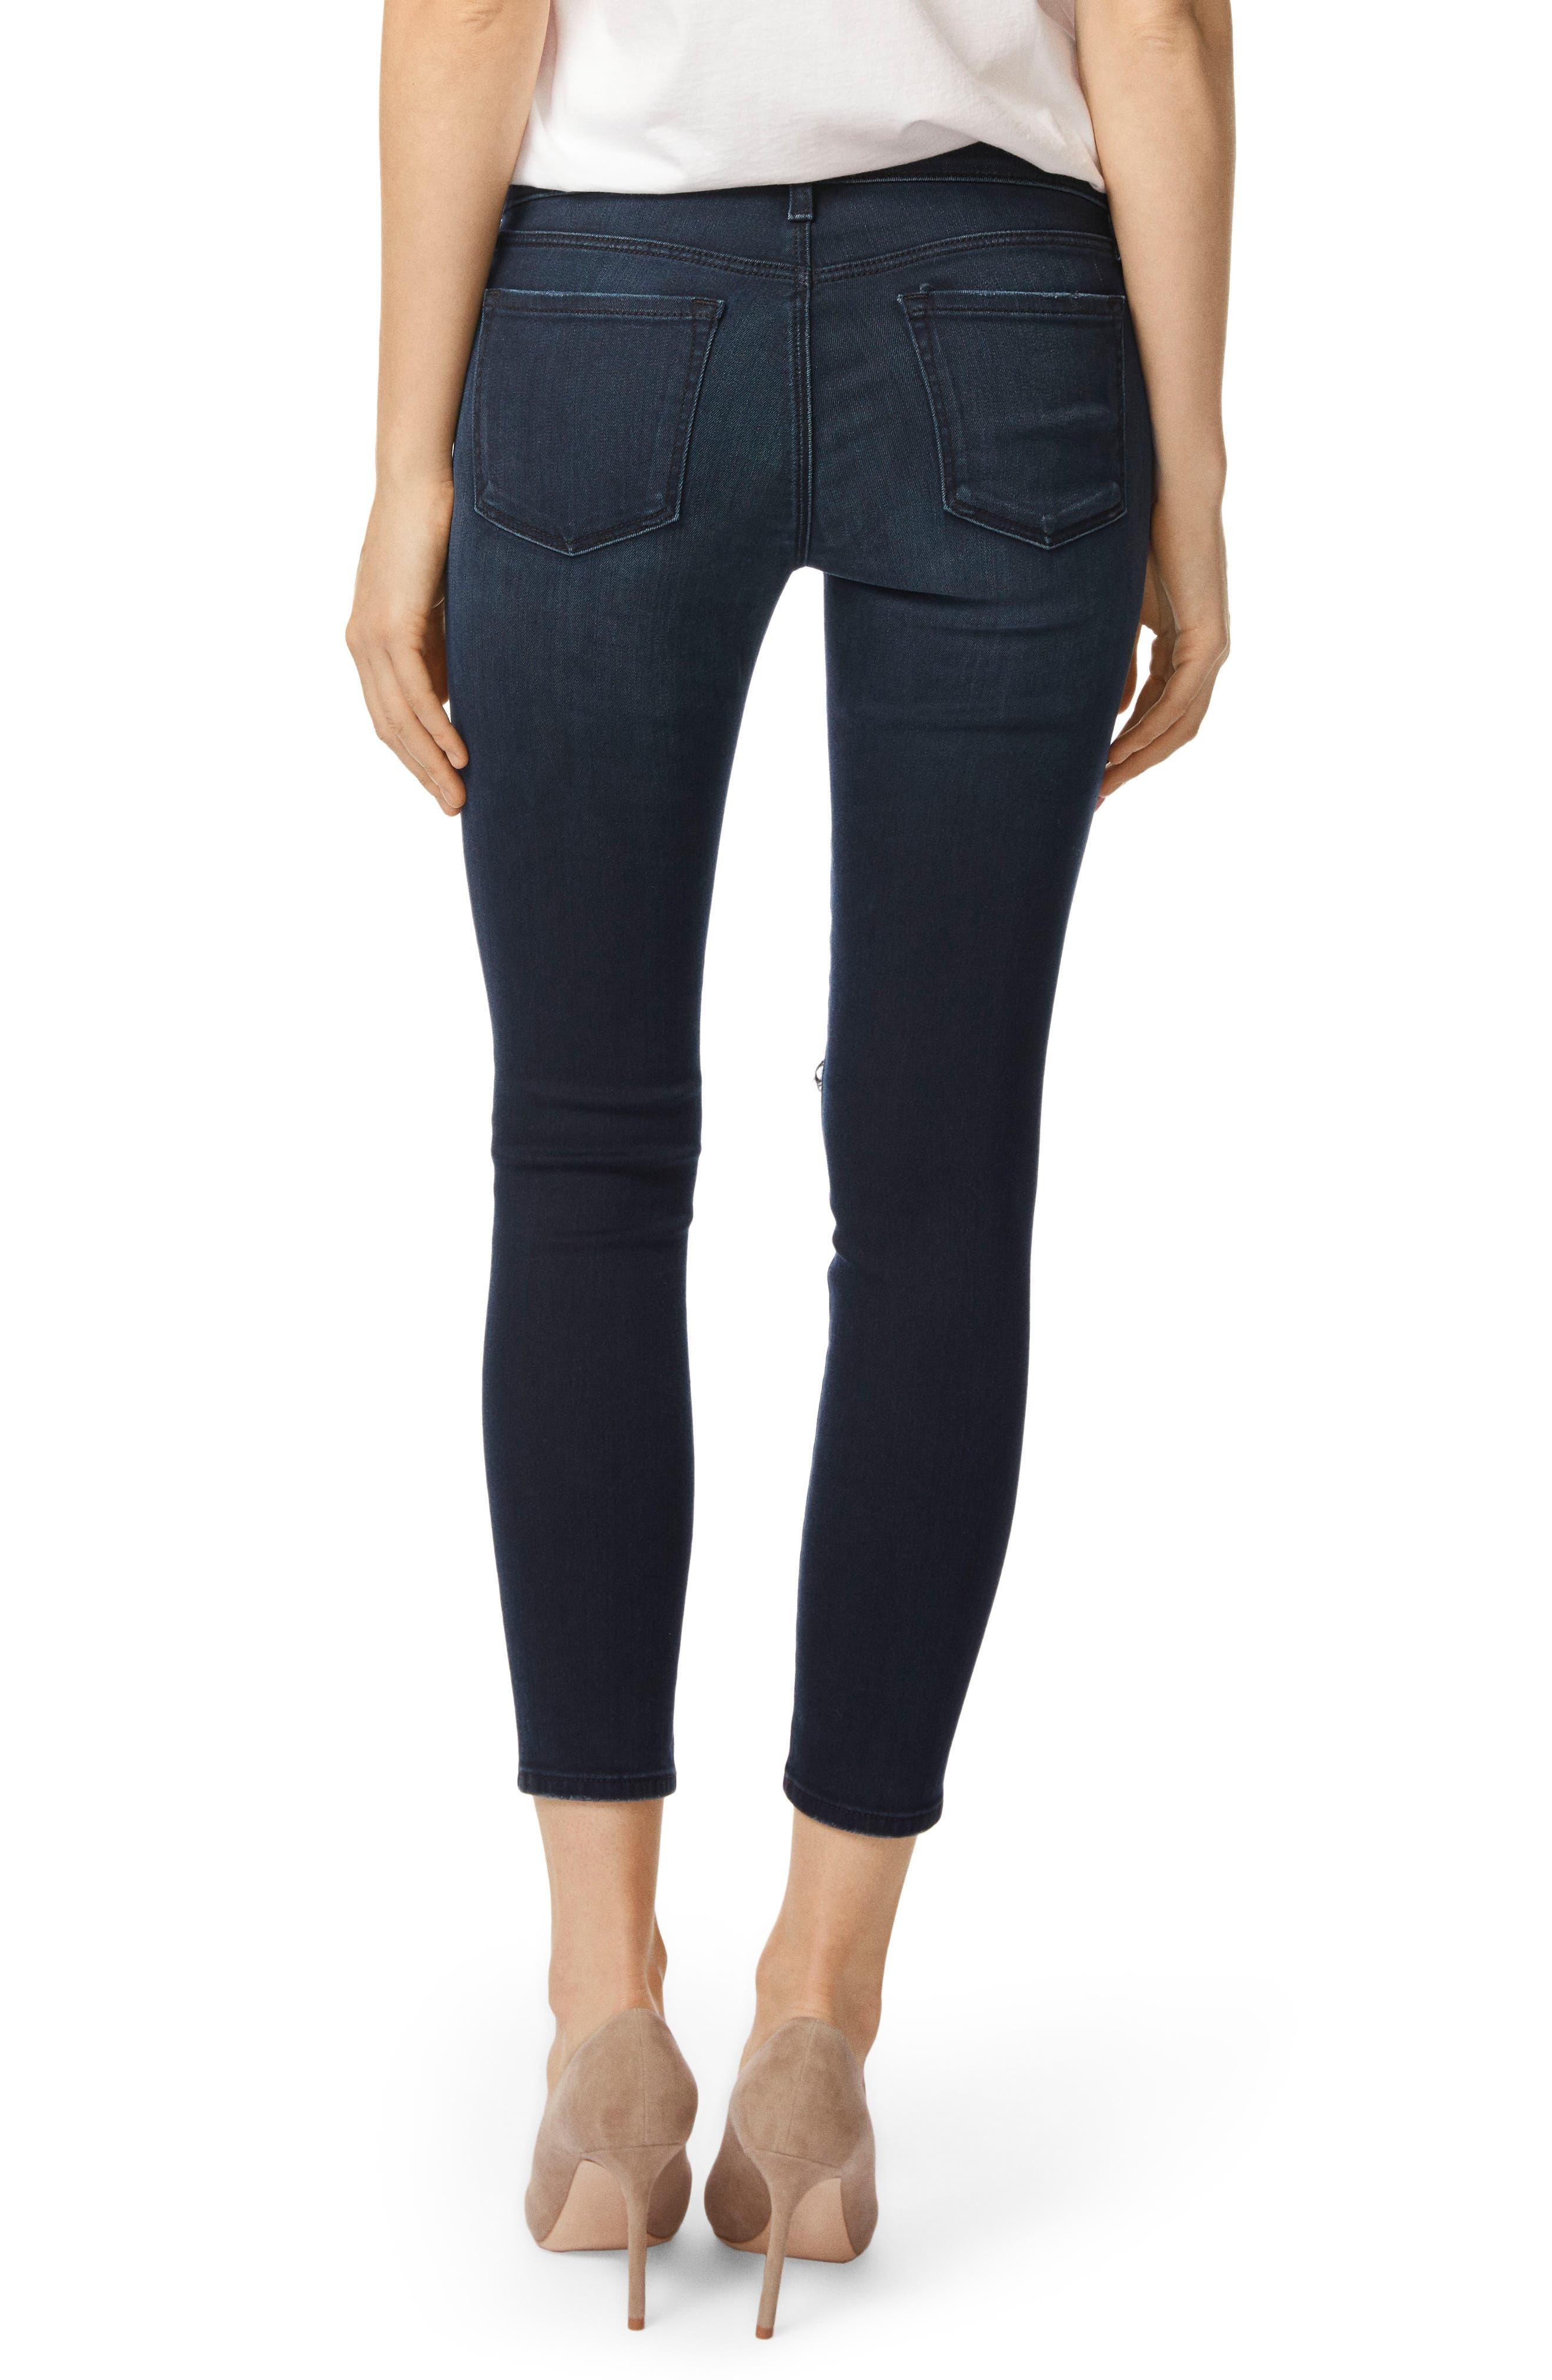 Alternate Image 2  - J Brand 9326 Low Rise Crop Skinny Jeans (Black Sea)